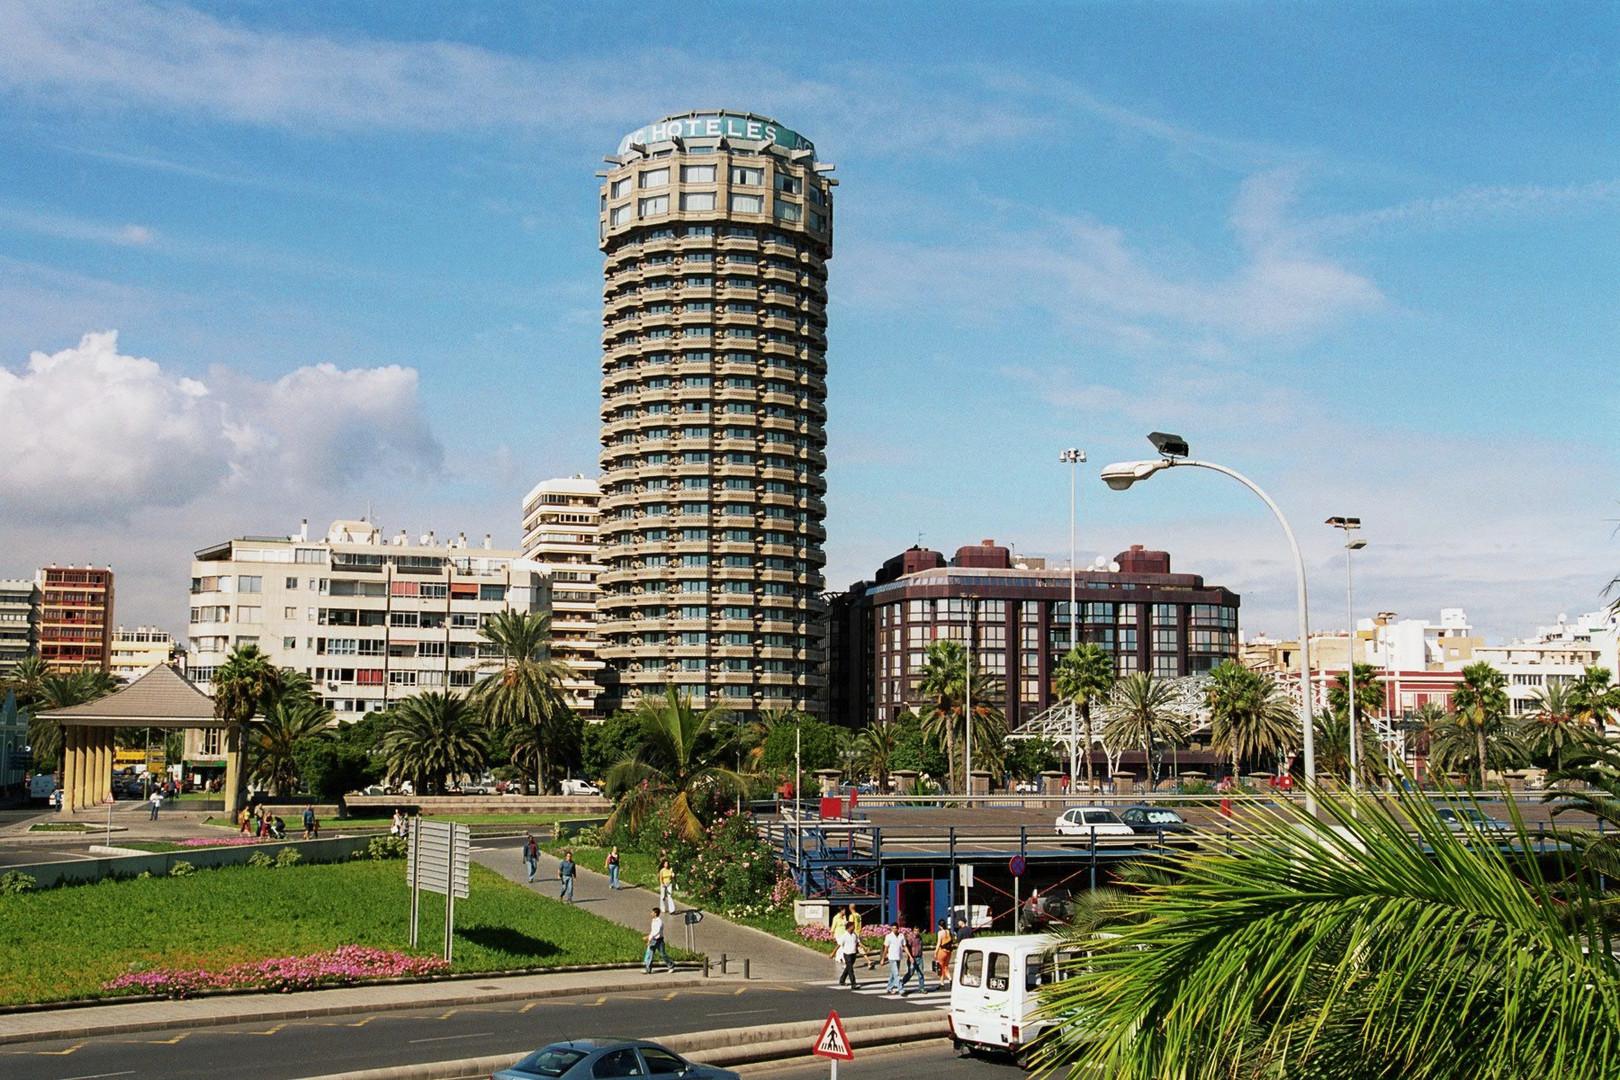 Hotelturm in Las Palmas